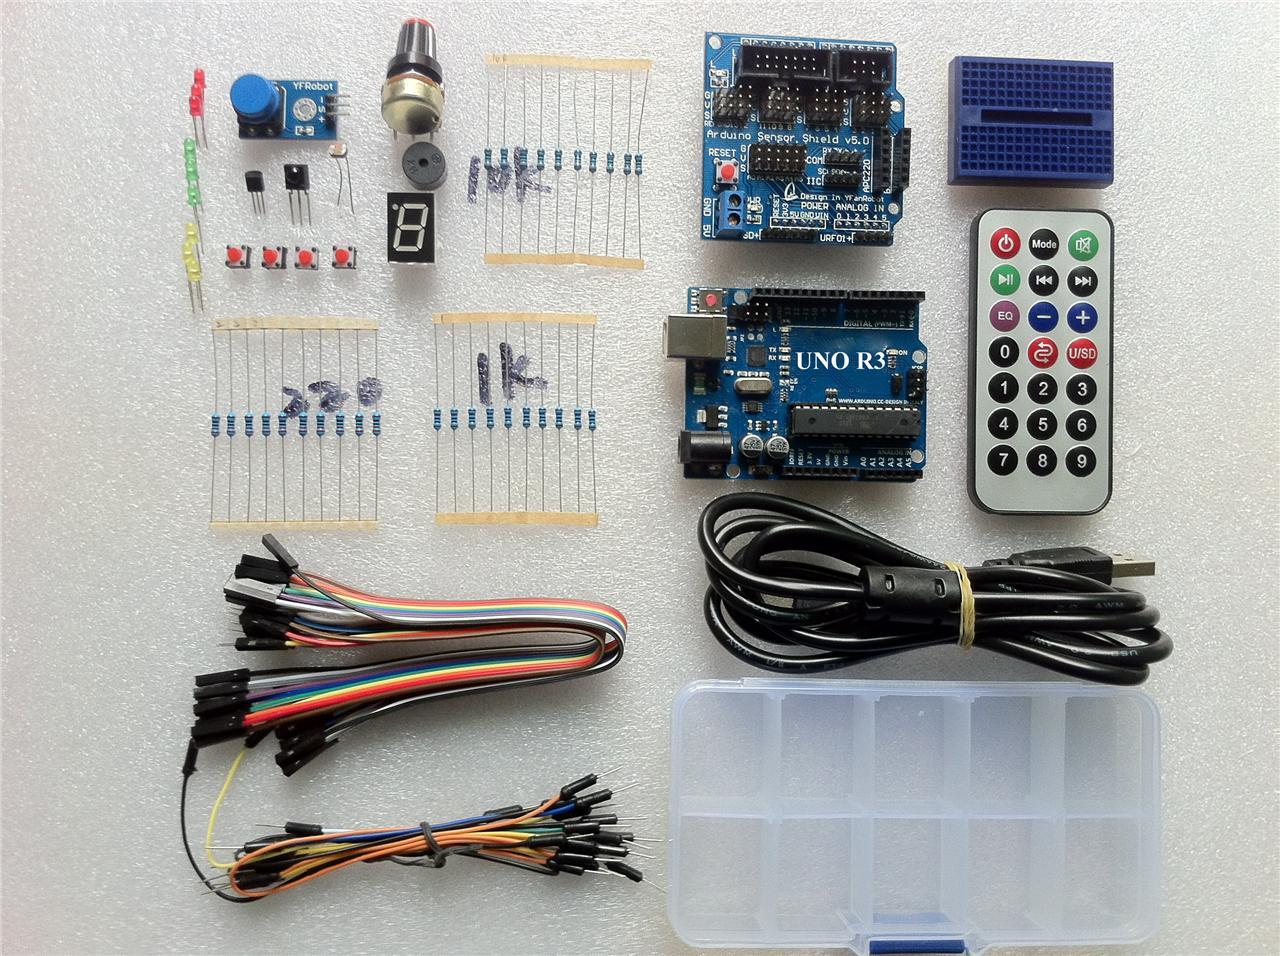 Sintron uno r board starter kit sensor shield pdf